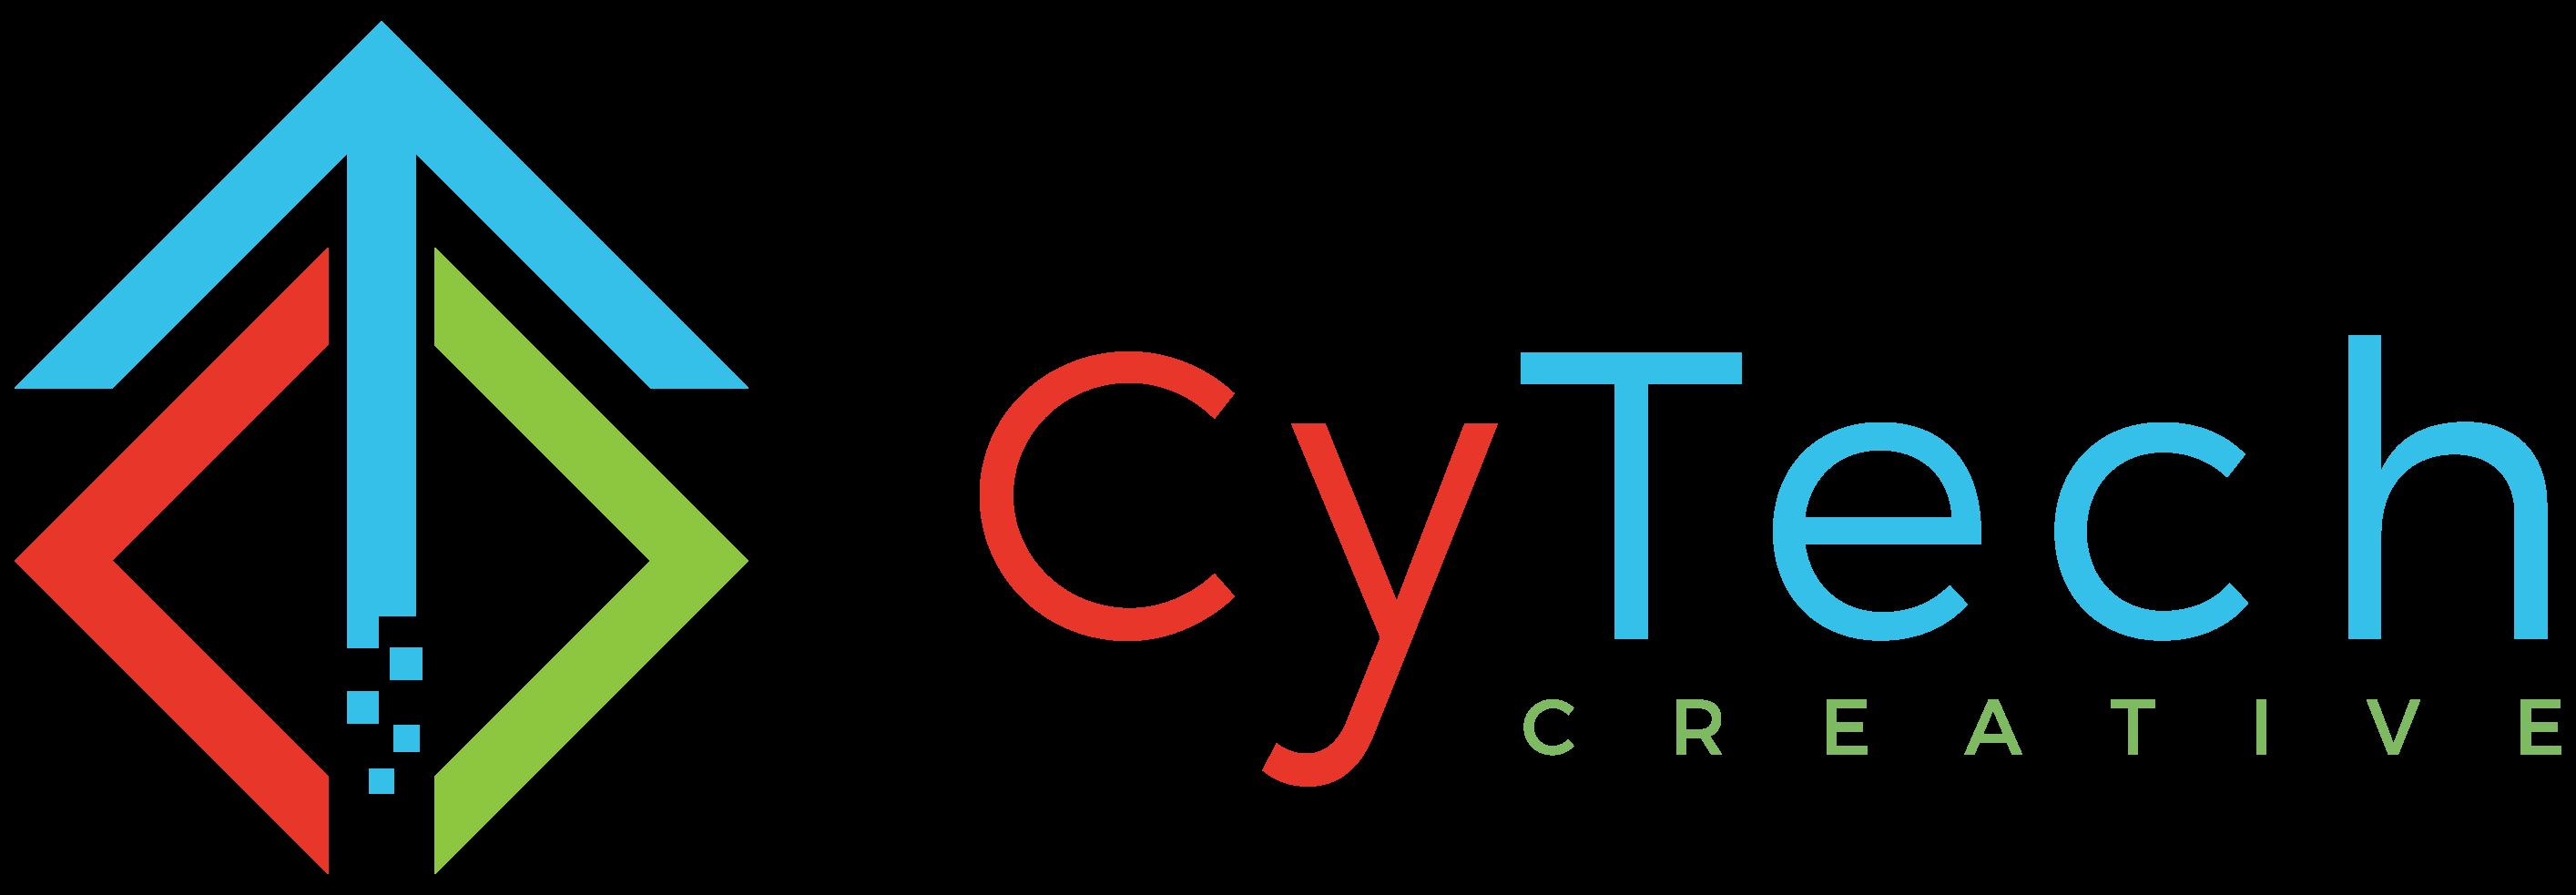 Cytech Creative